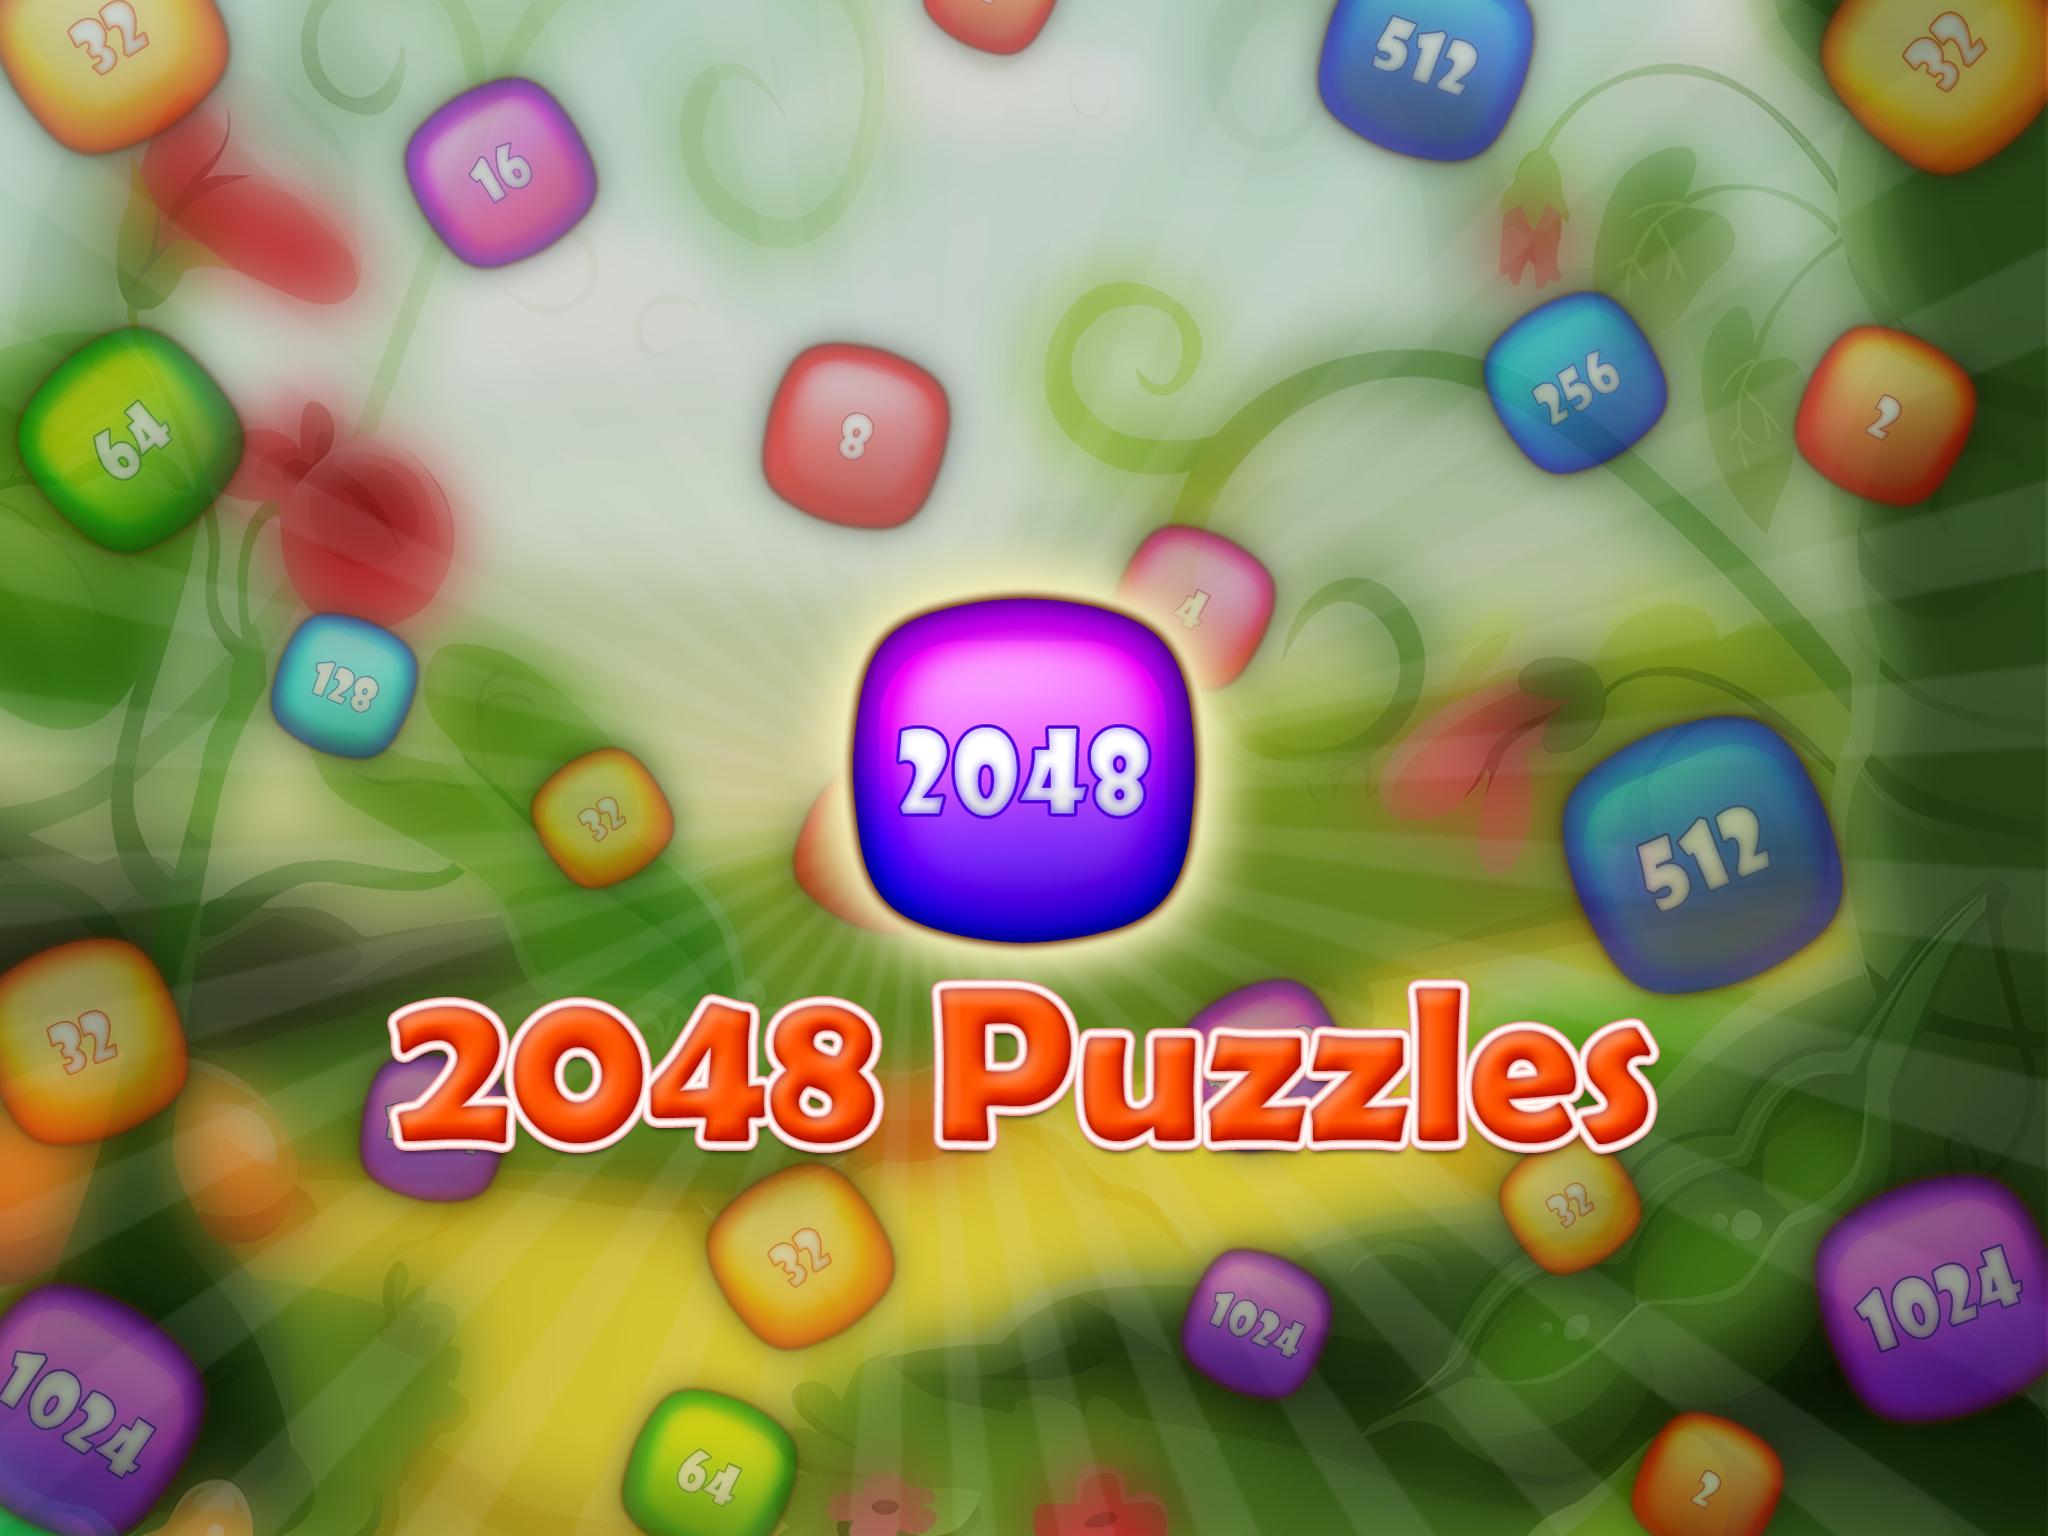 2048 Puzzles